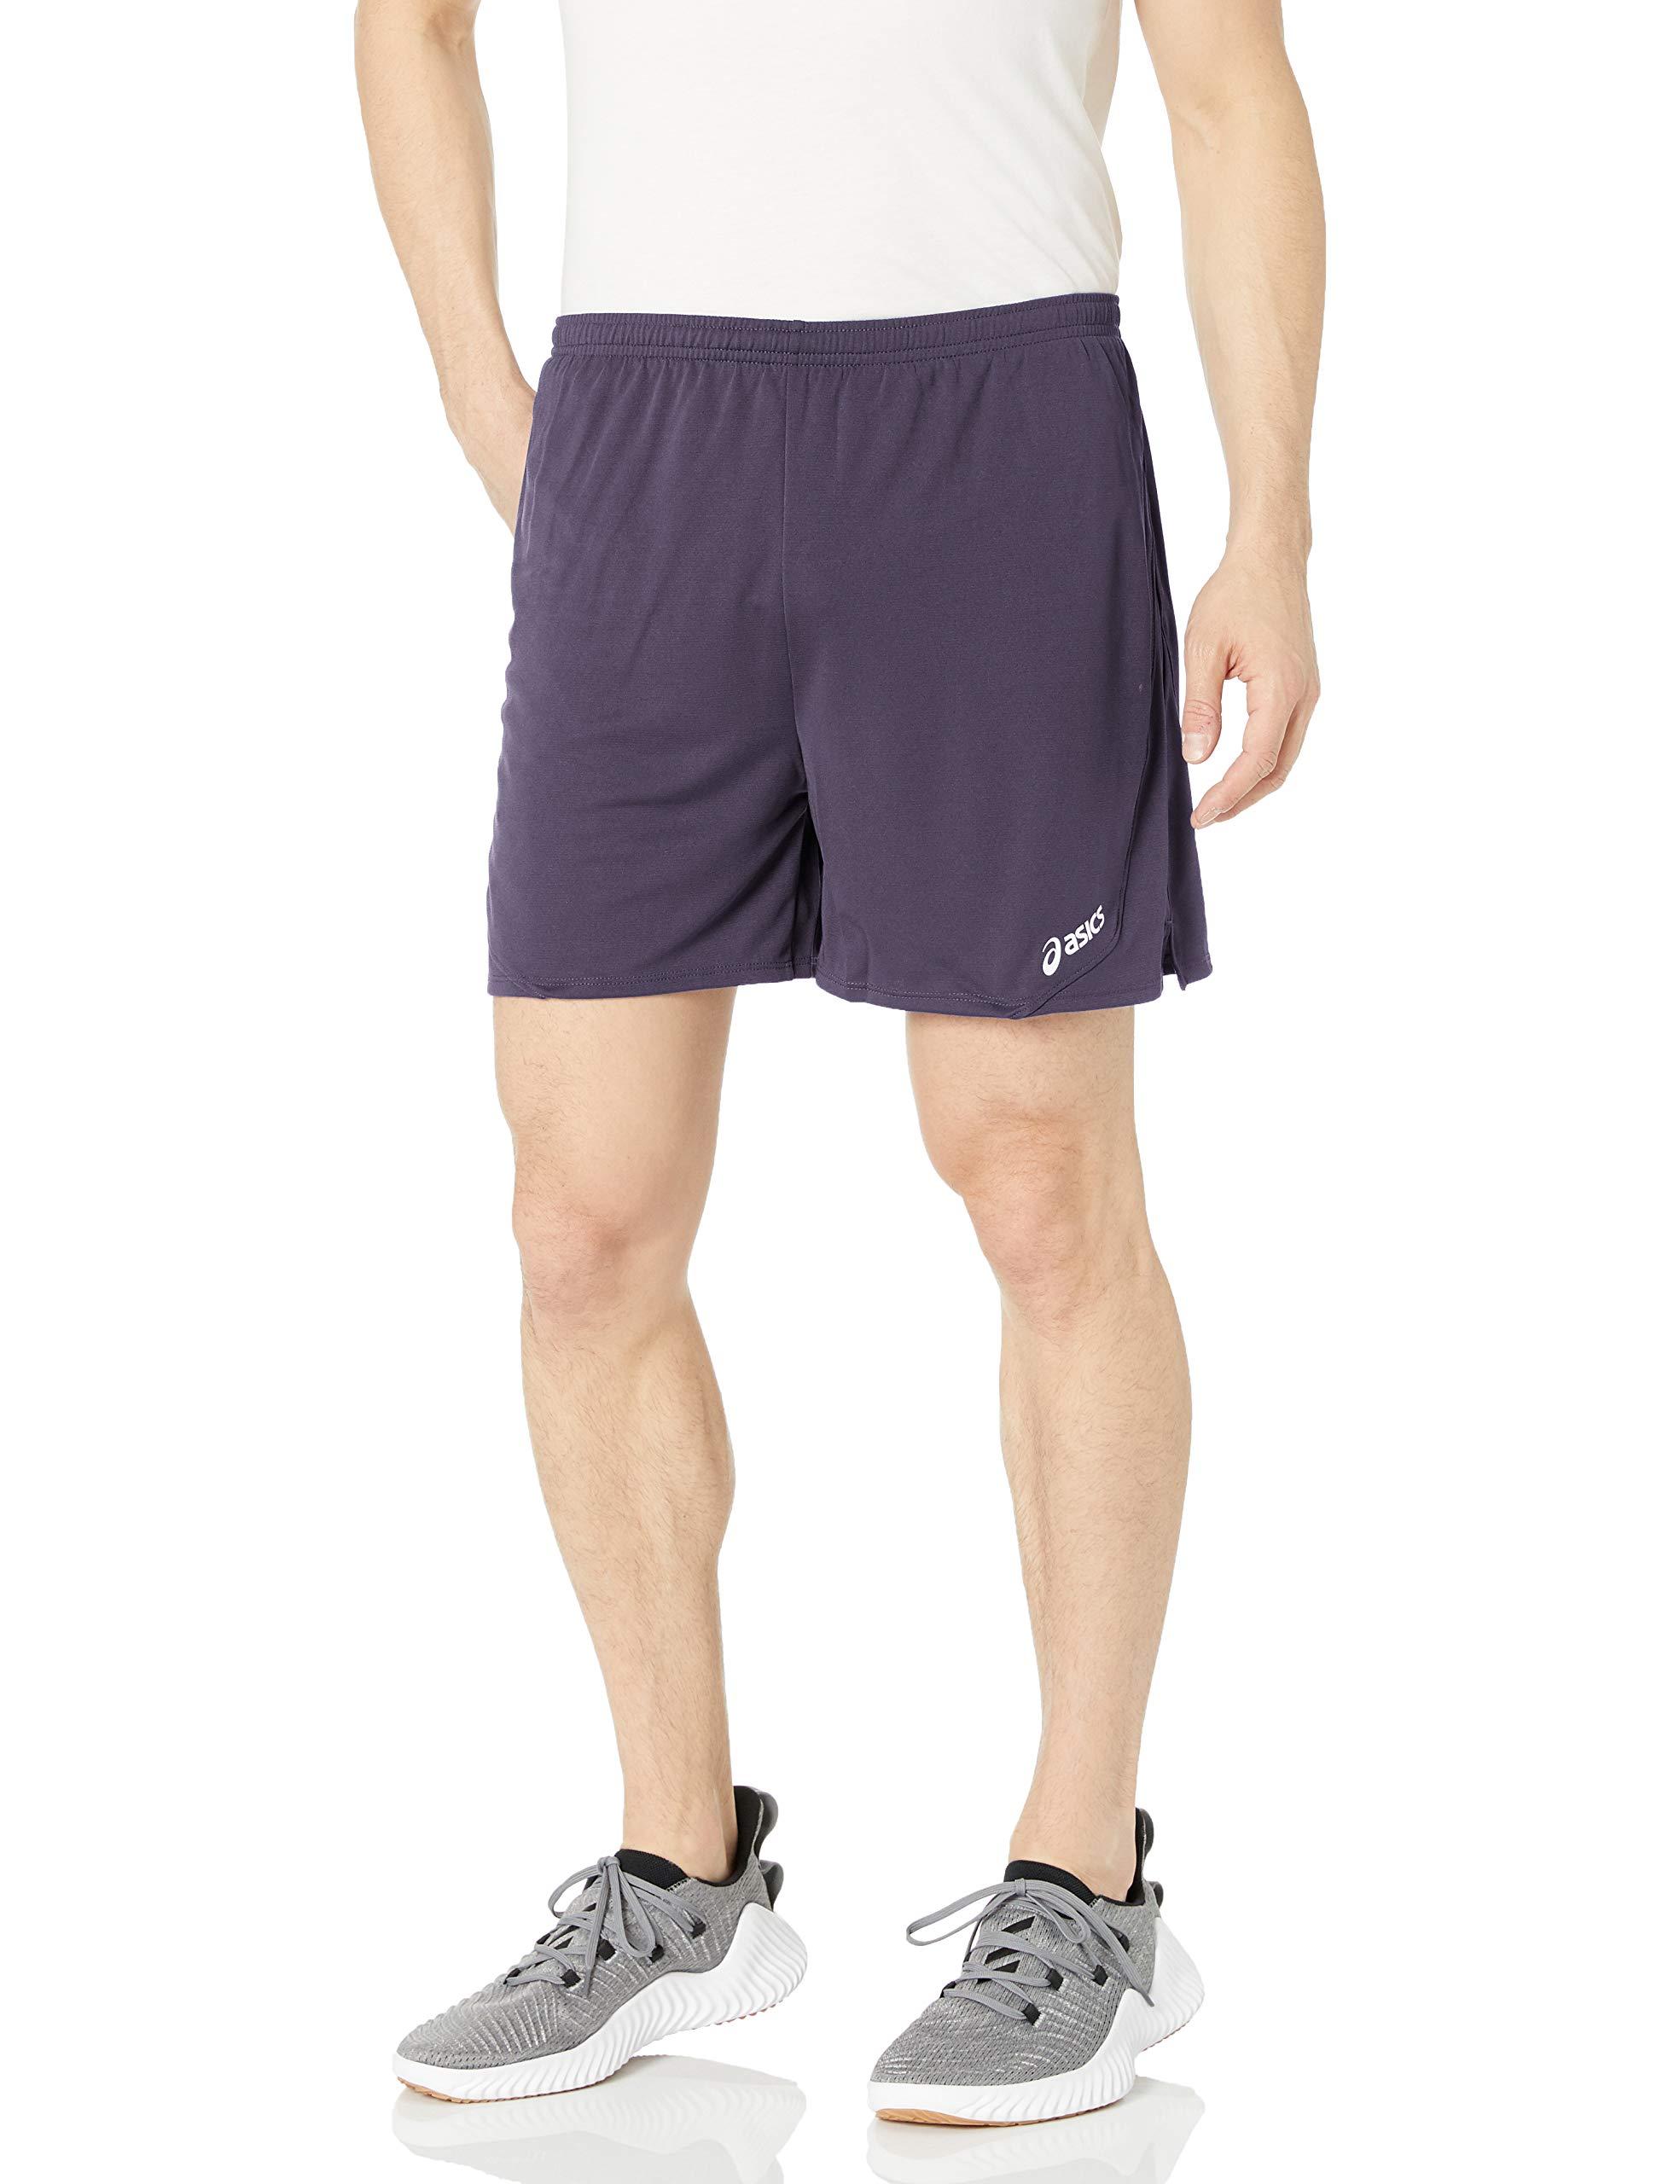 ASICS Rival Shorts Steel Large